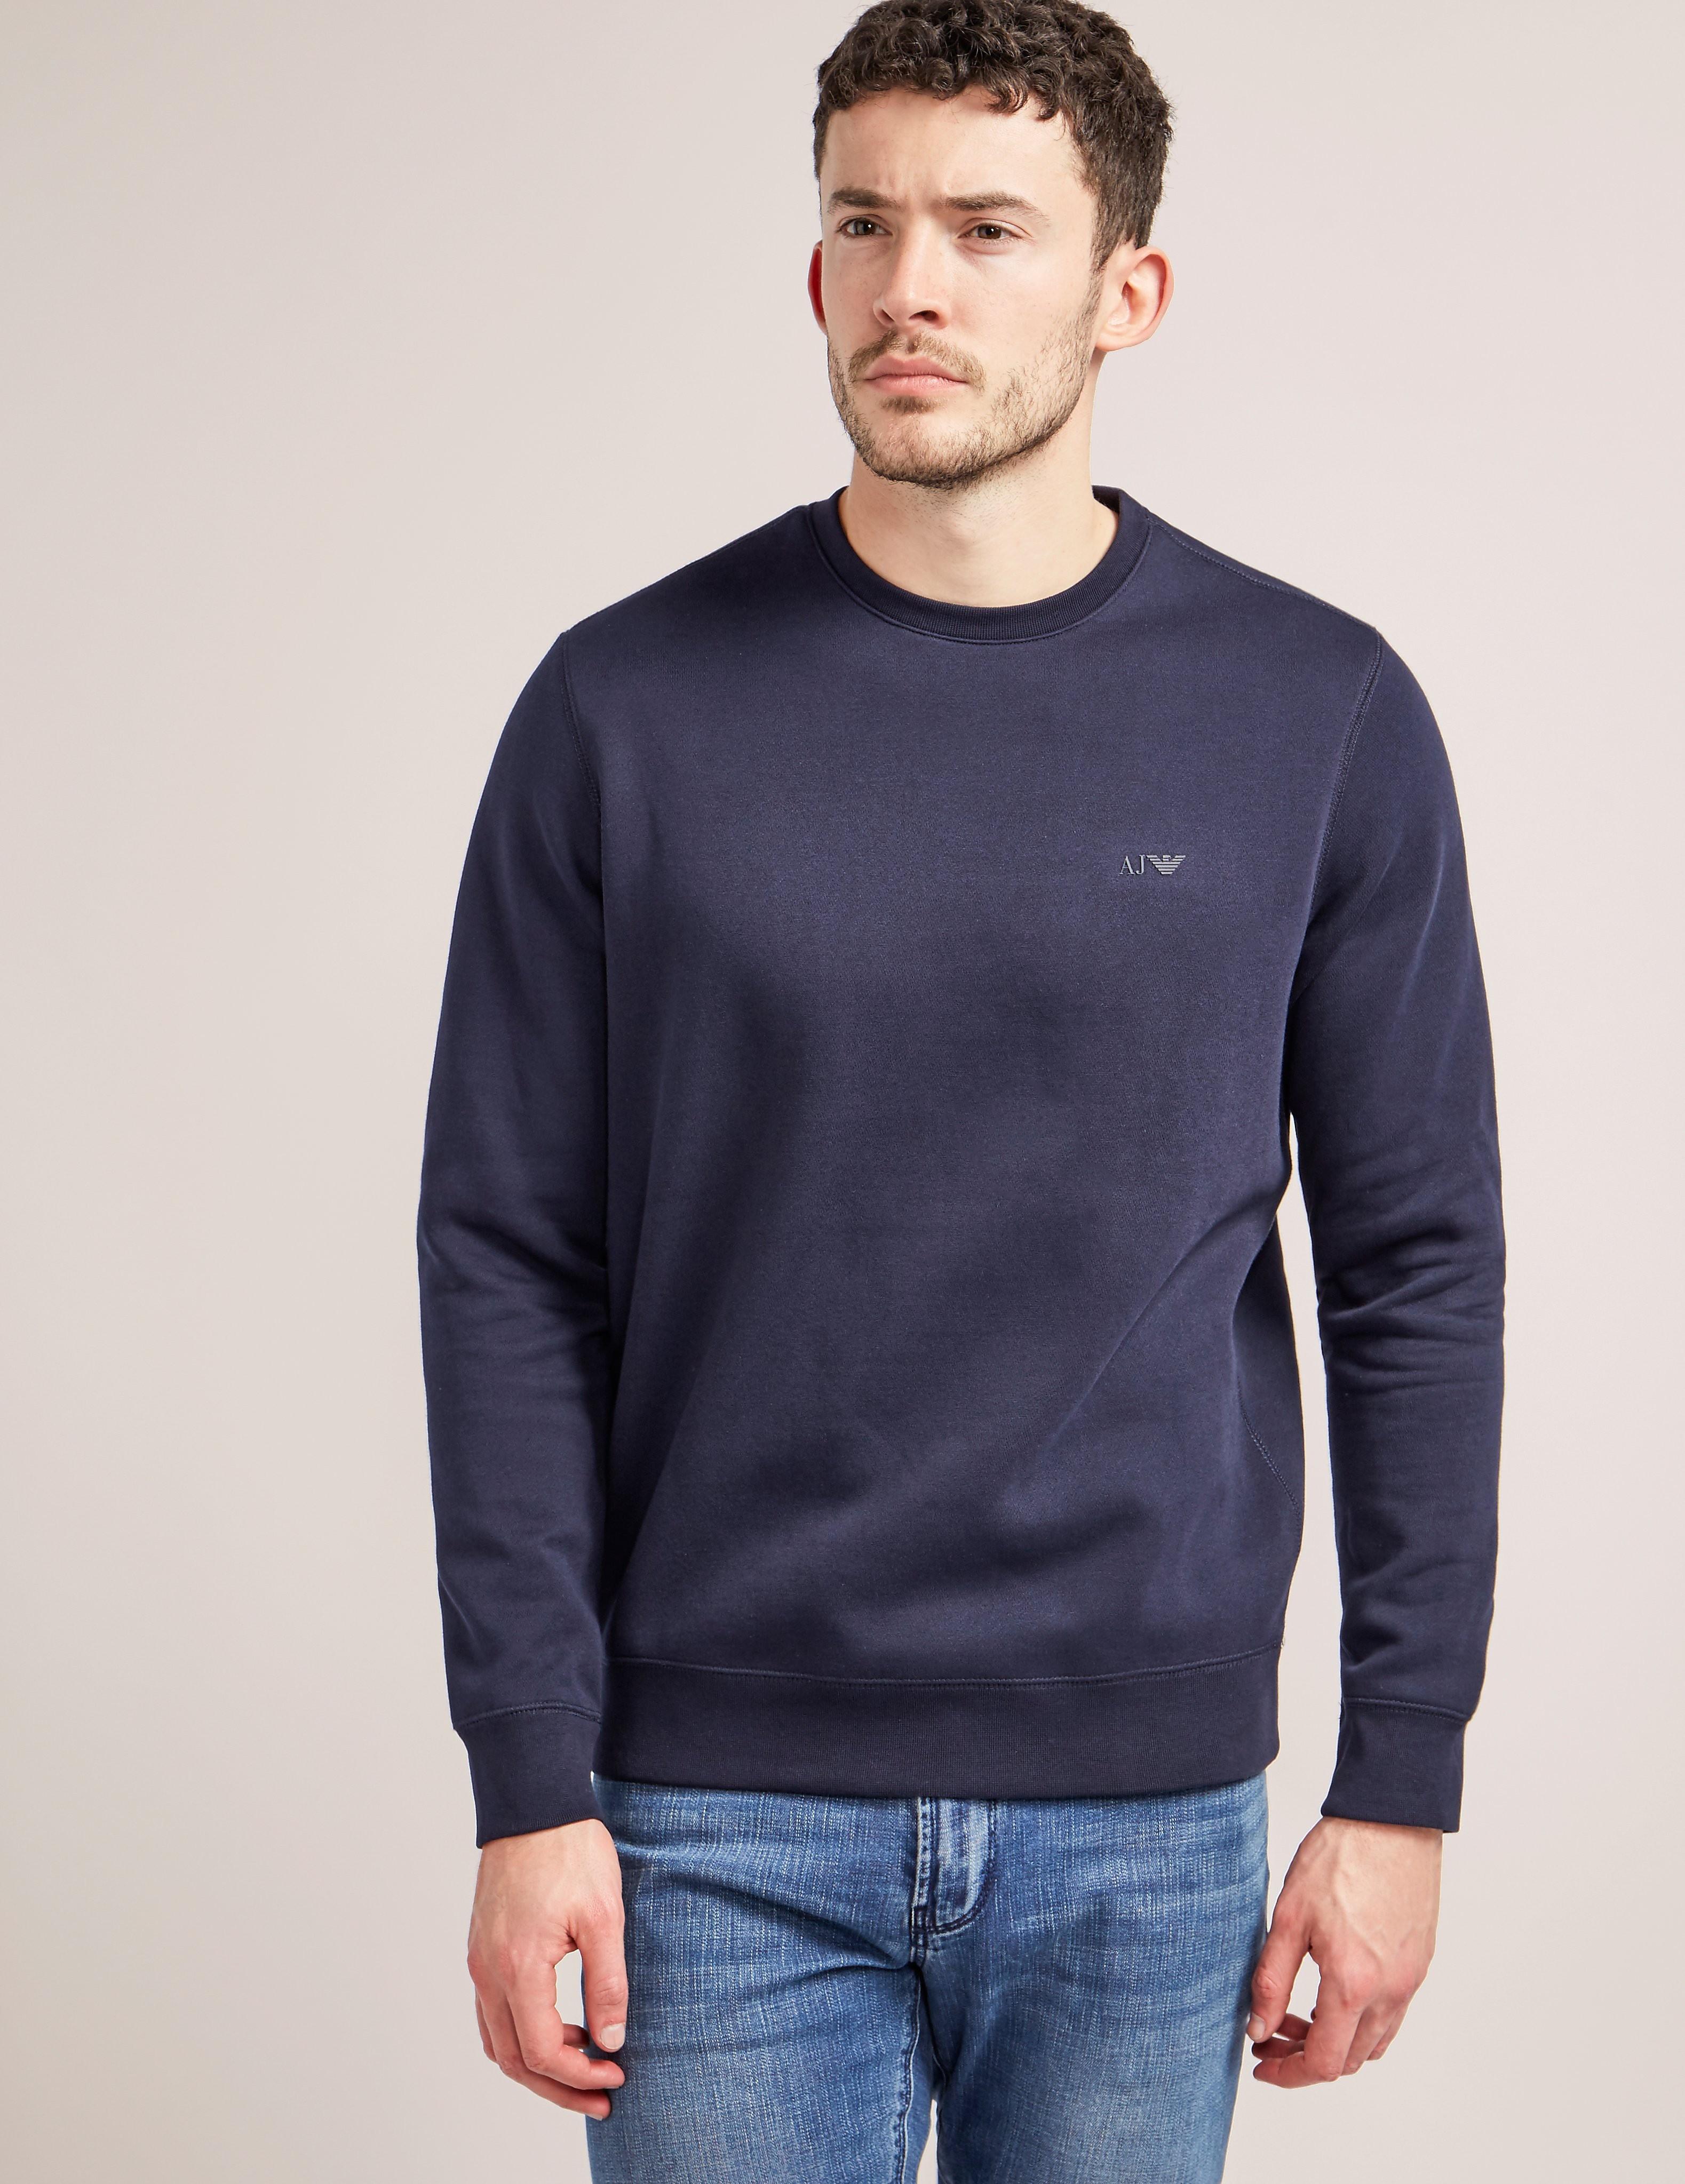 Armani Jeans Crew Neck Sweatshirt